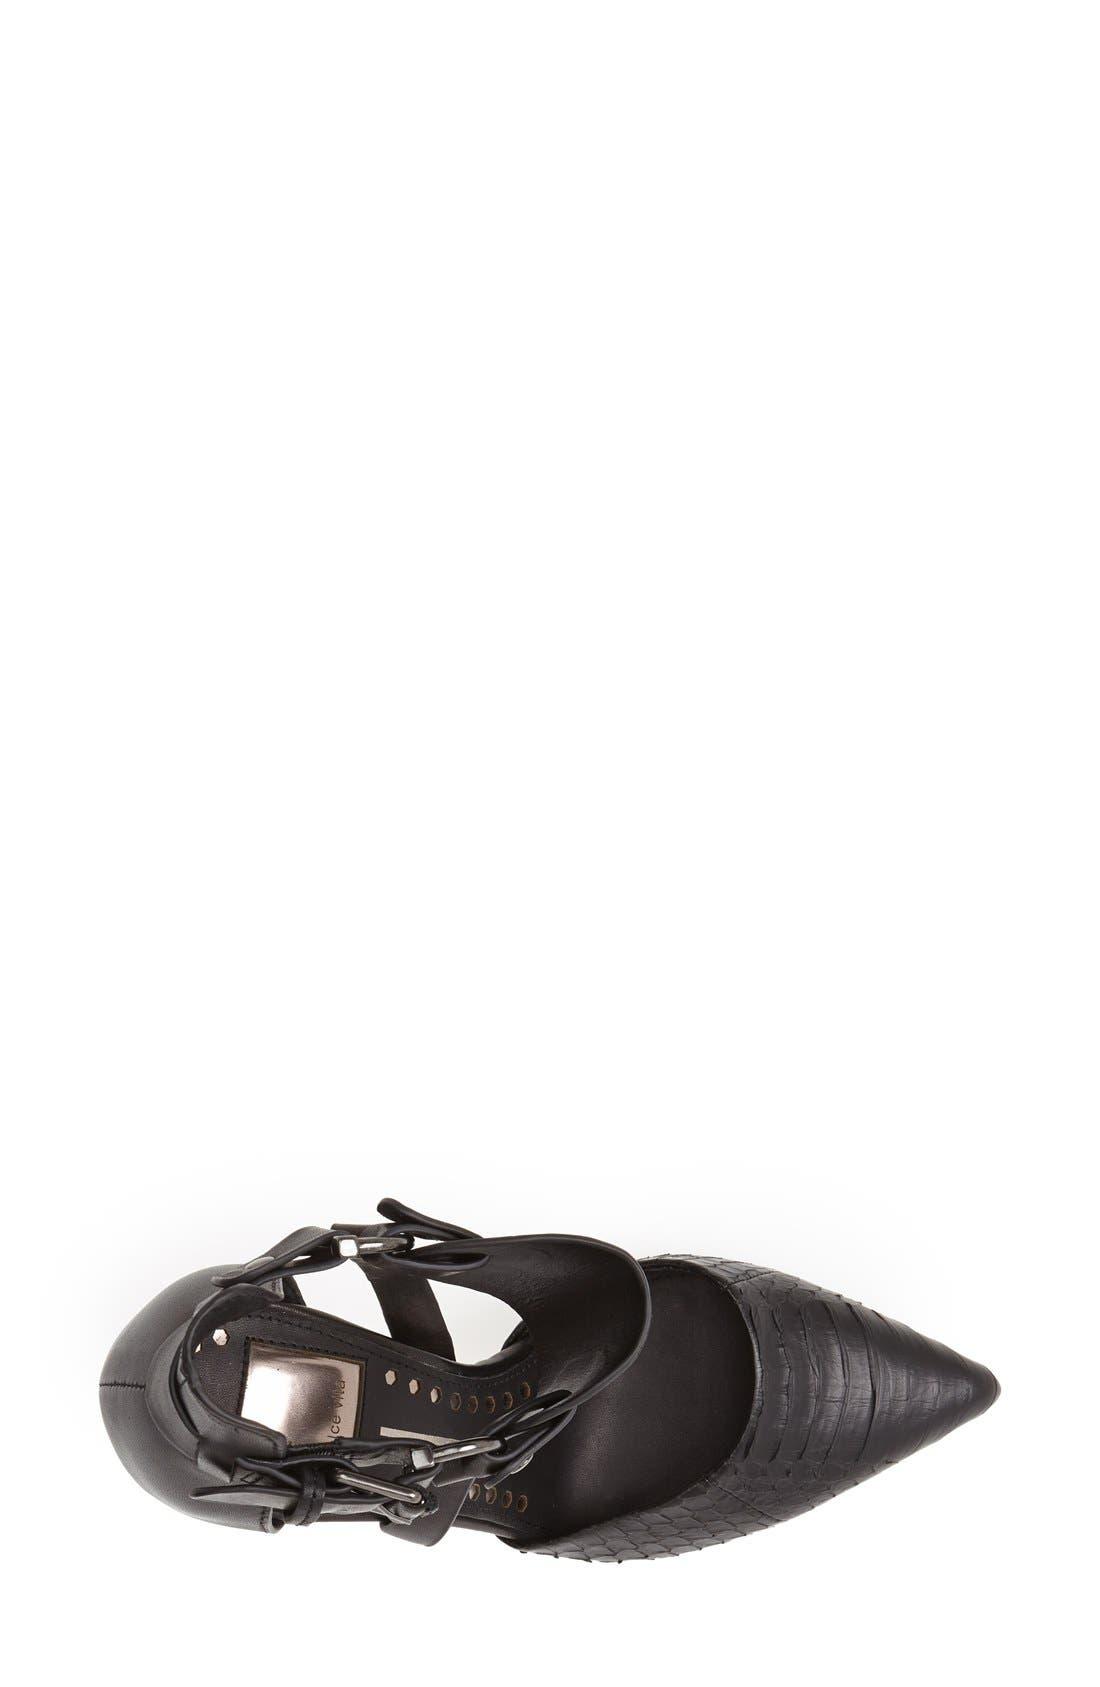 Alternate Image 3  - Dolce Vita 'Knoxx' Leather Pump (Women)